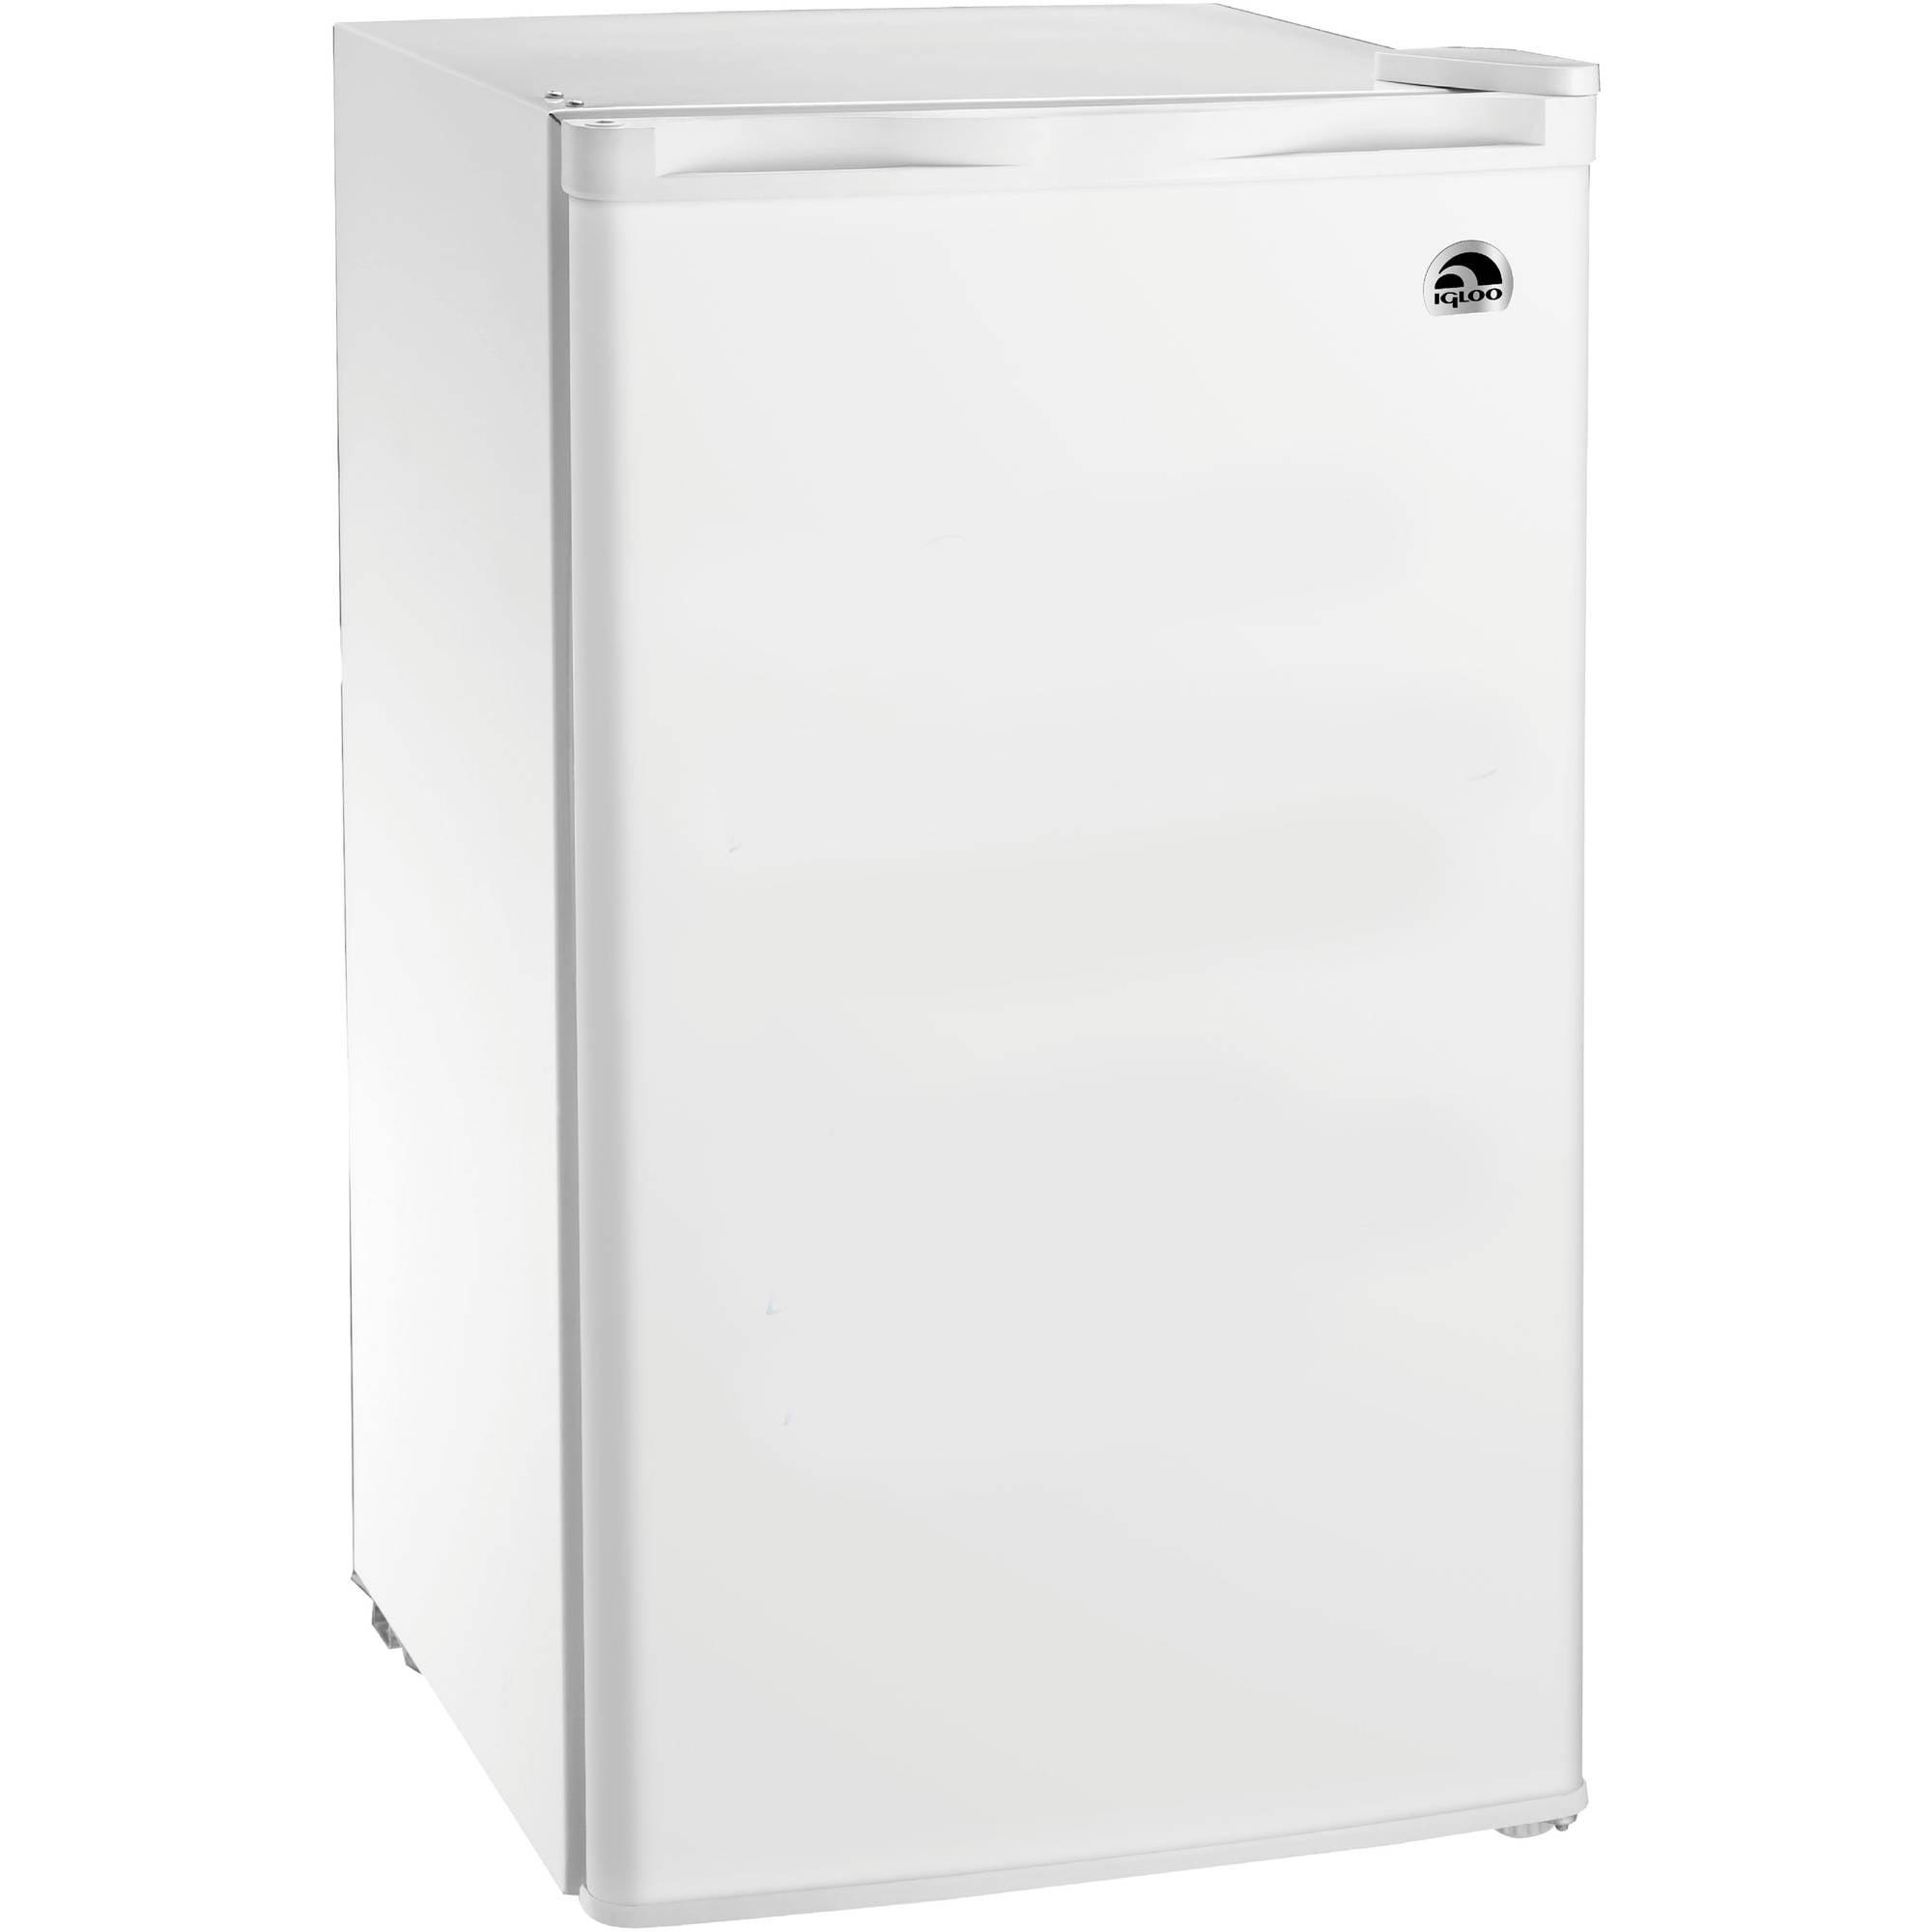 Igloo 4 5 Cu Ft Refrigerator And Freezer Black Fr464